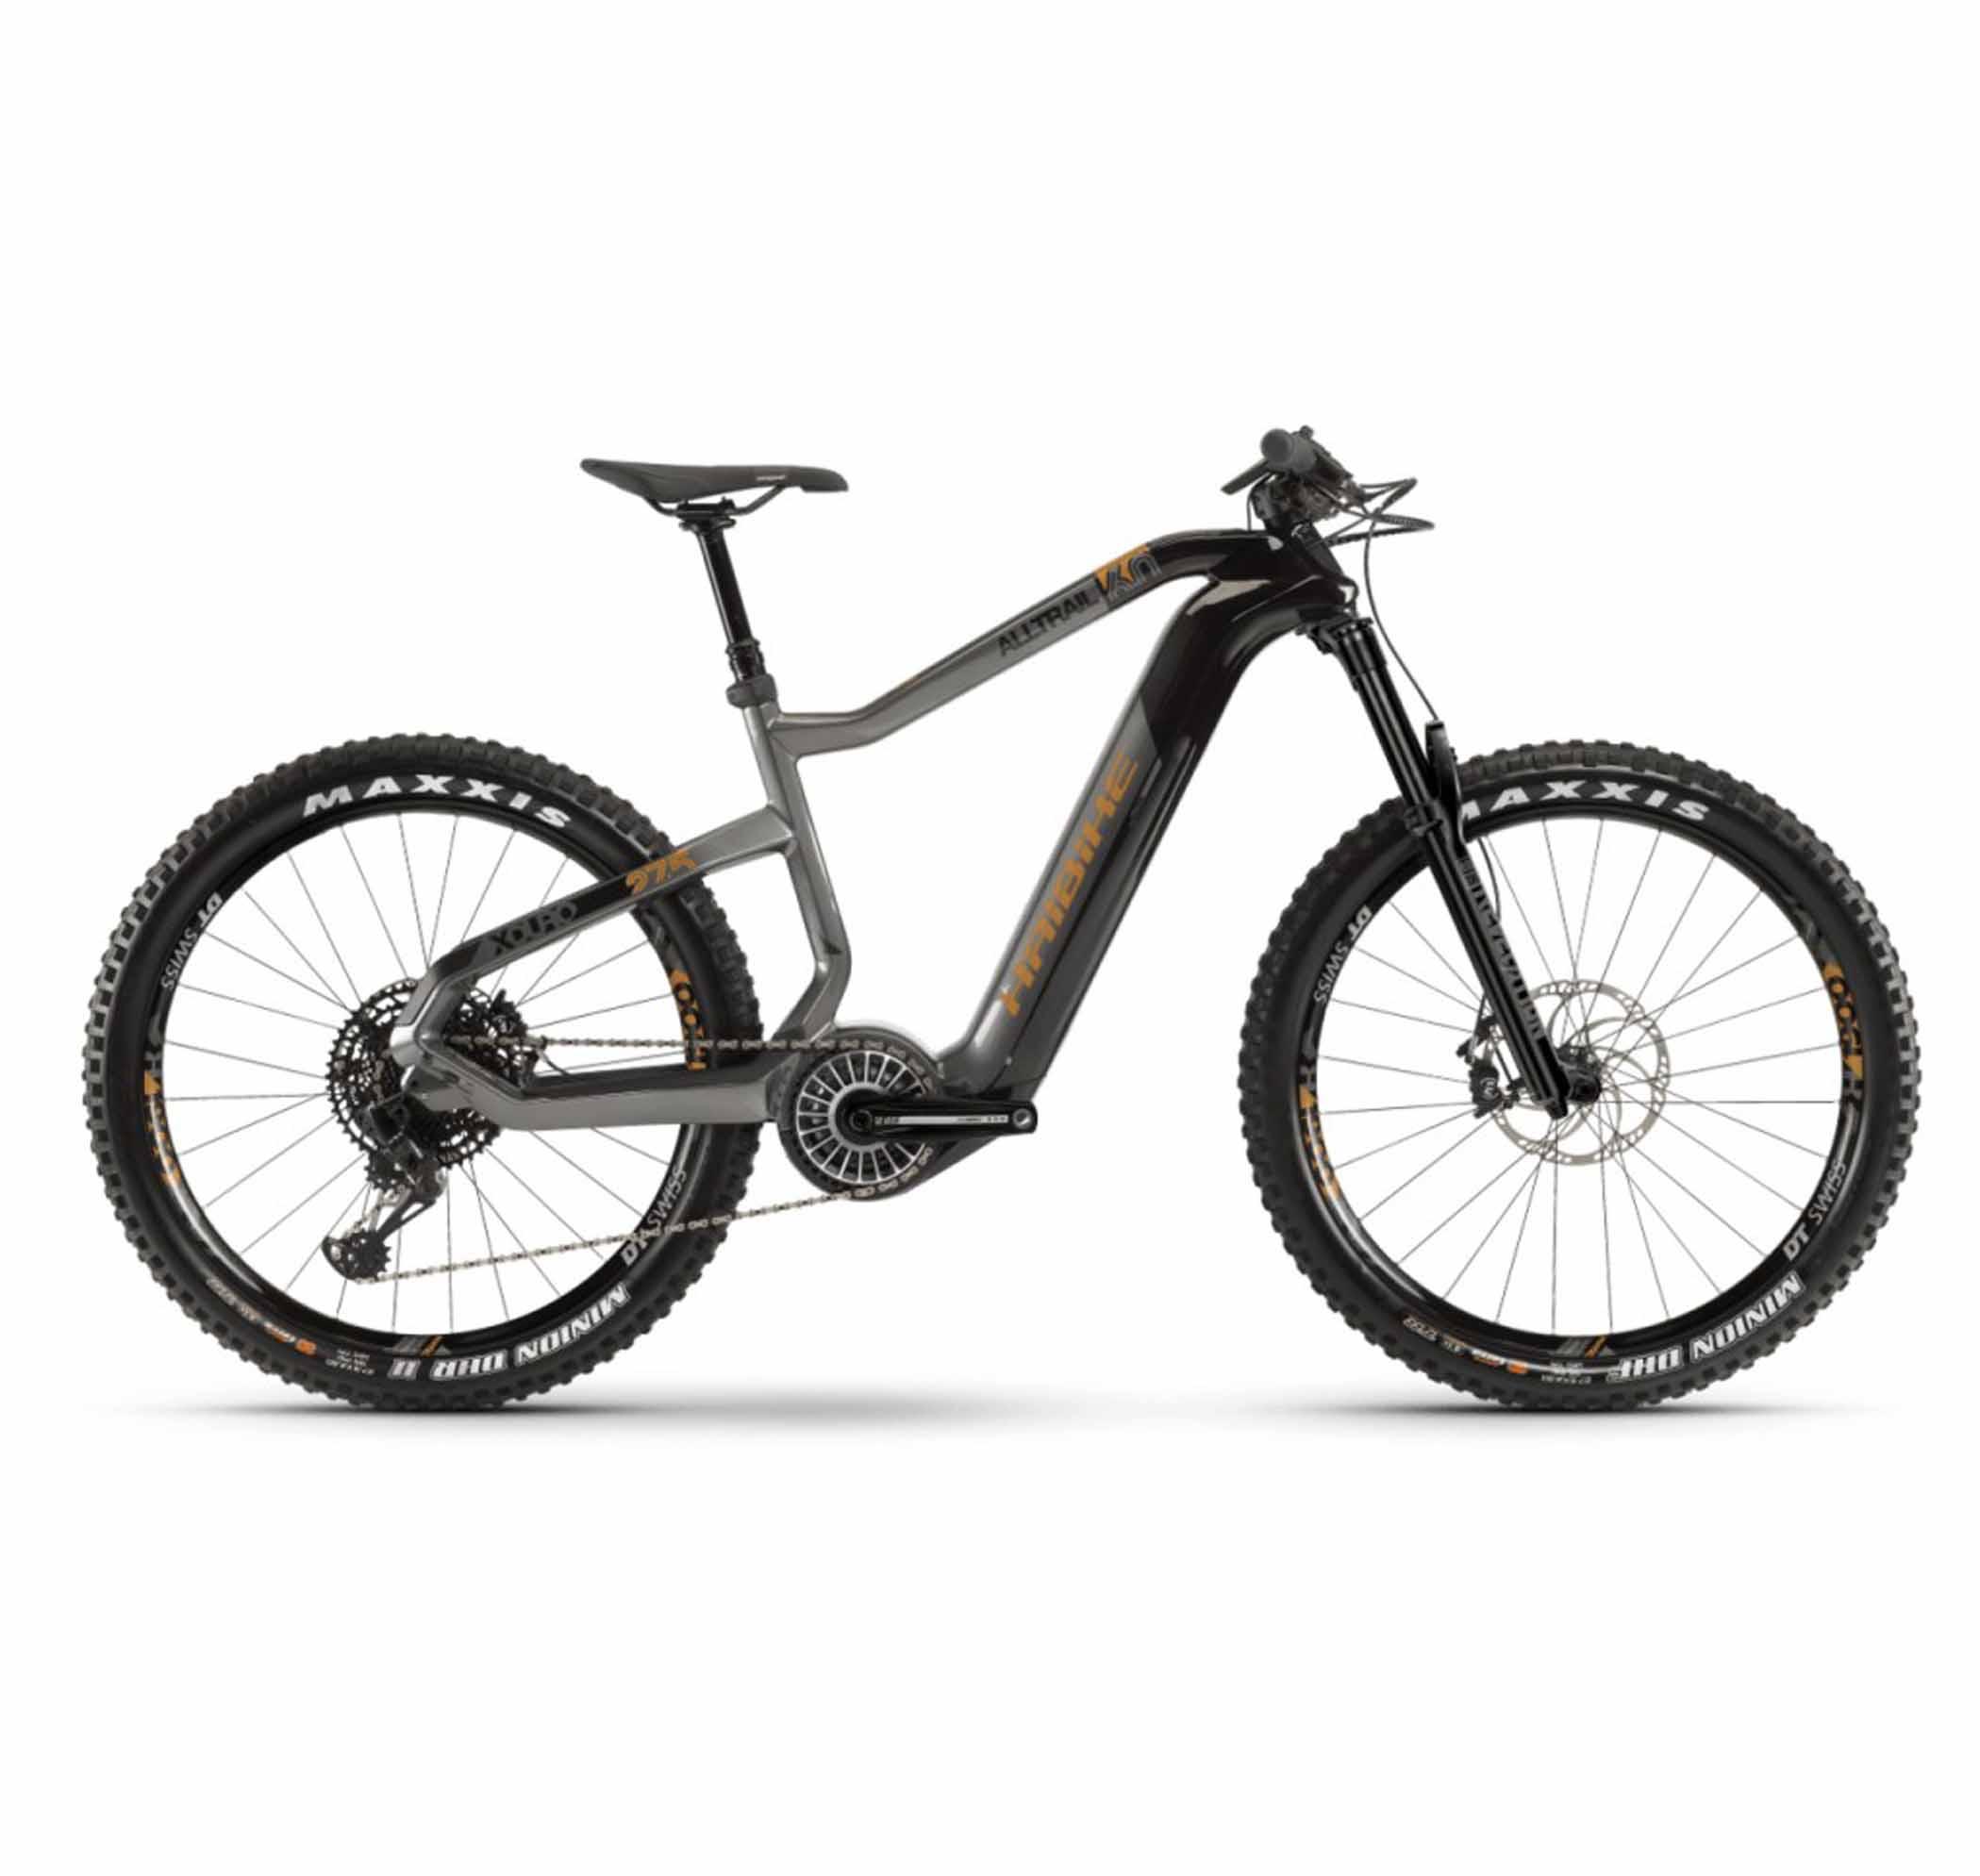 Haibike_Rodeo_Bike_Flyon_XDURO_AllTrail_6.0